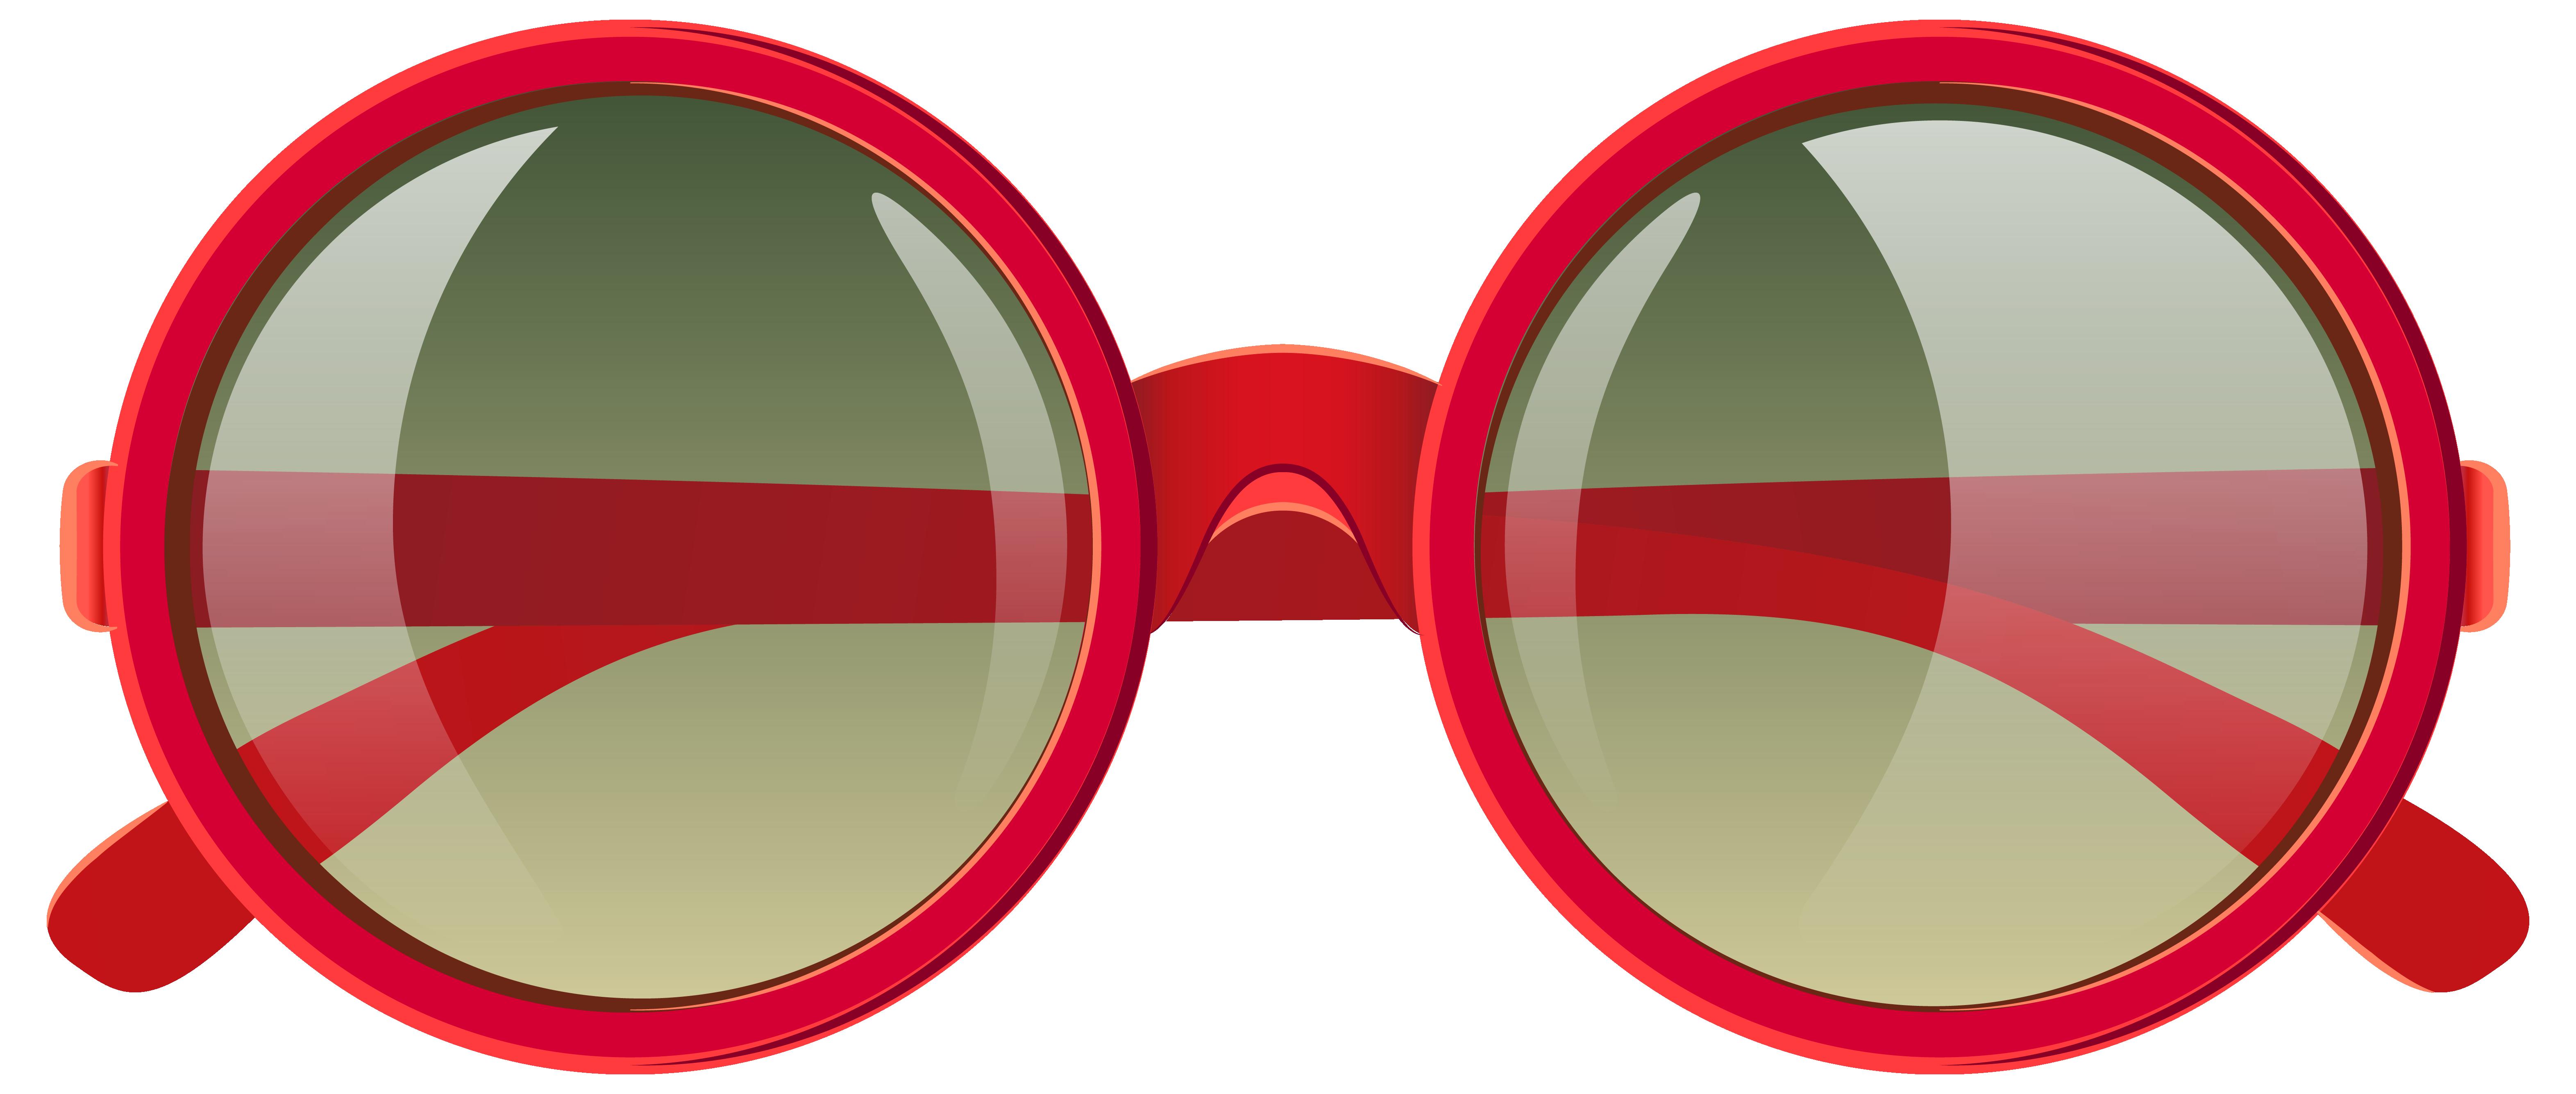 6287x2669 Goggles Clipart Cute Glass